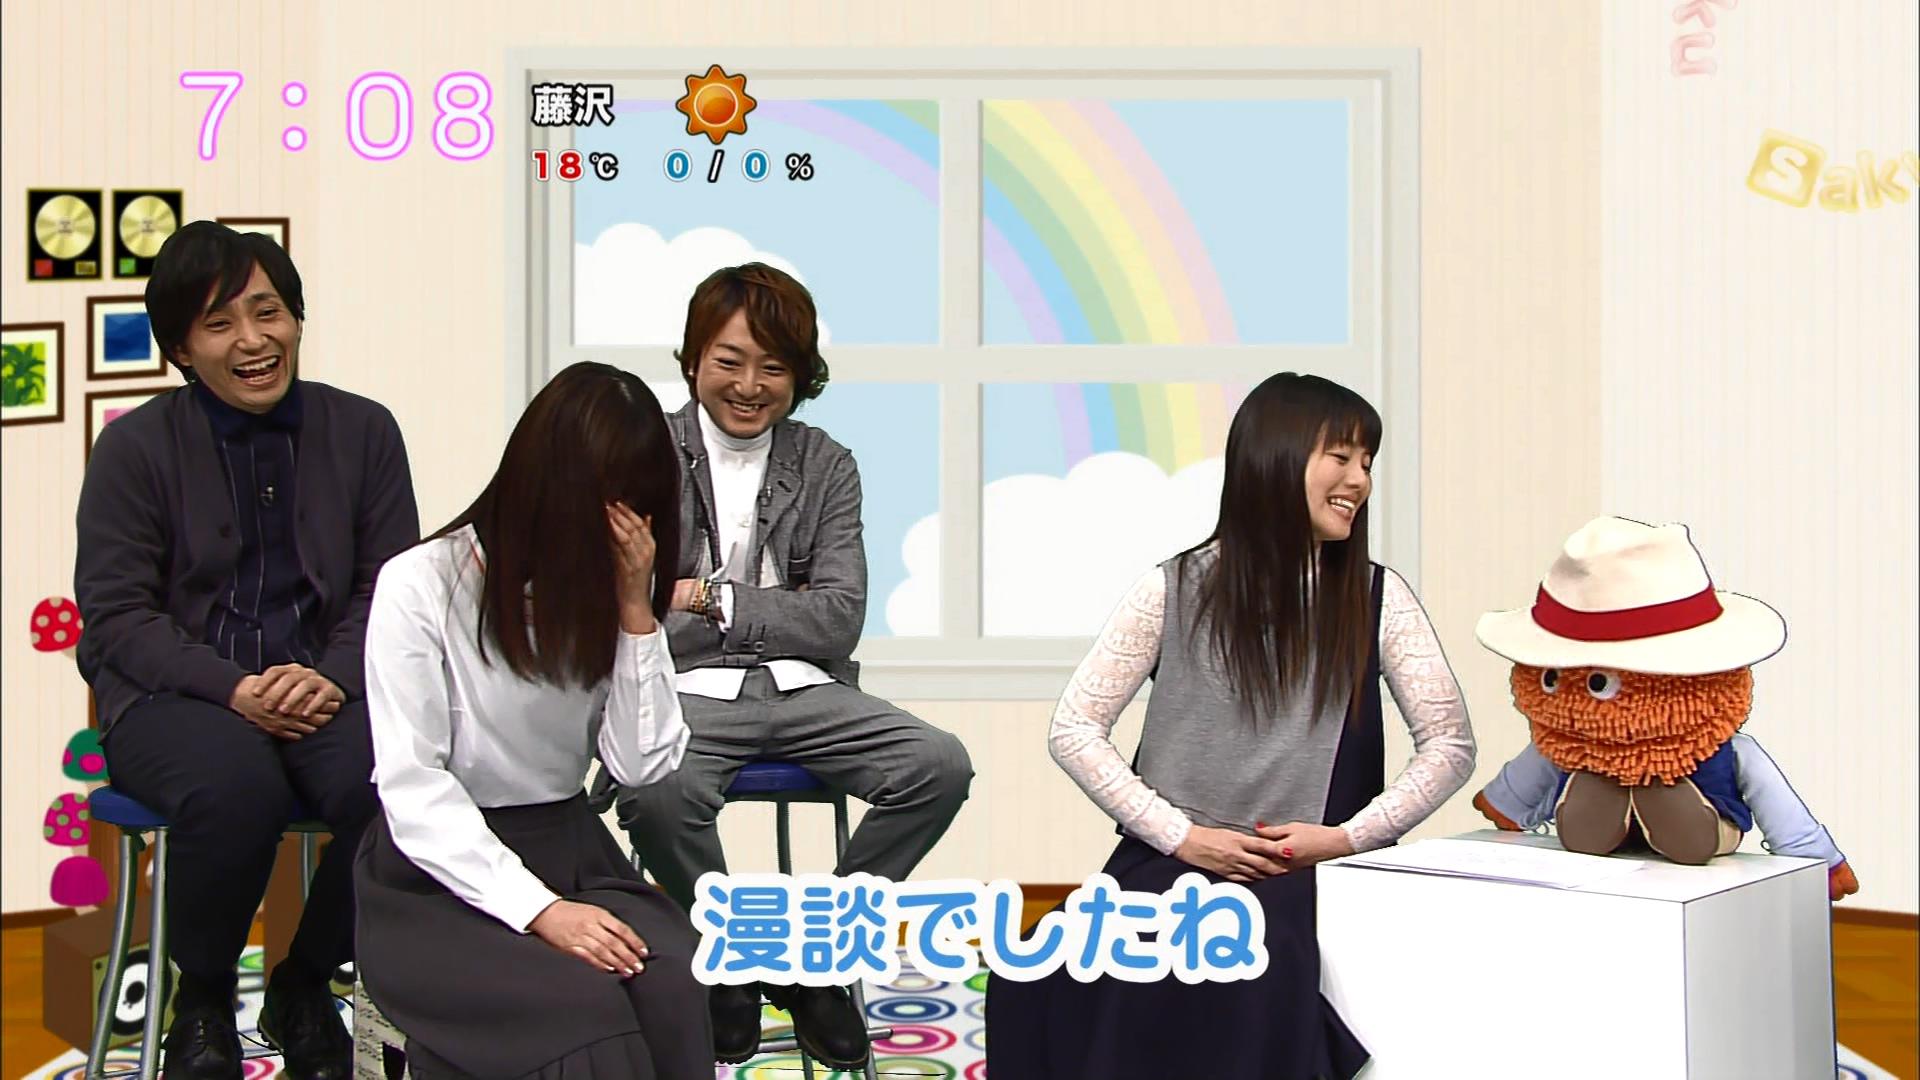 2016.03.17 いきものがかり(saku saku).ts_20160317_080335.461